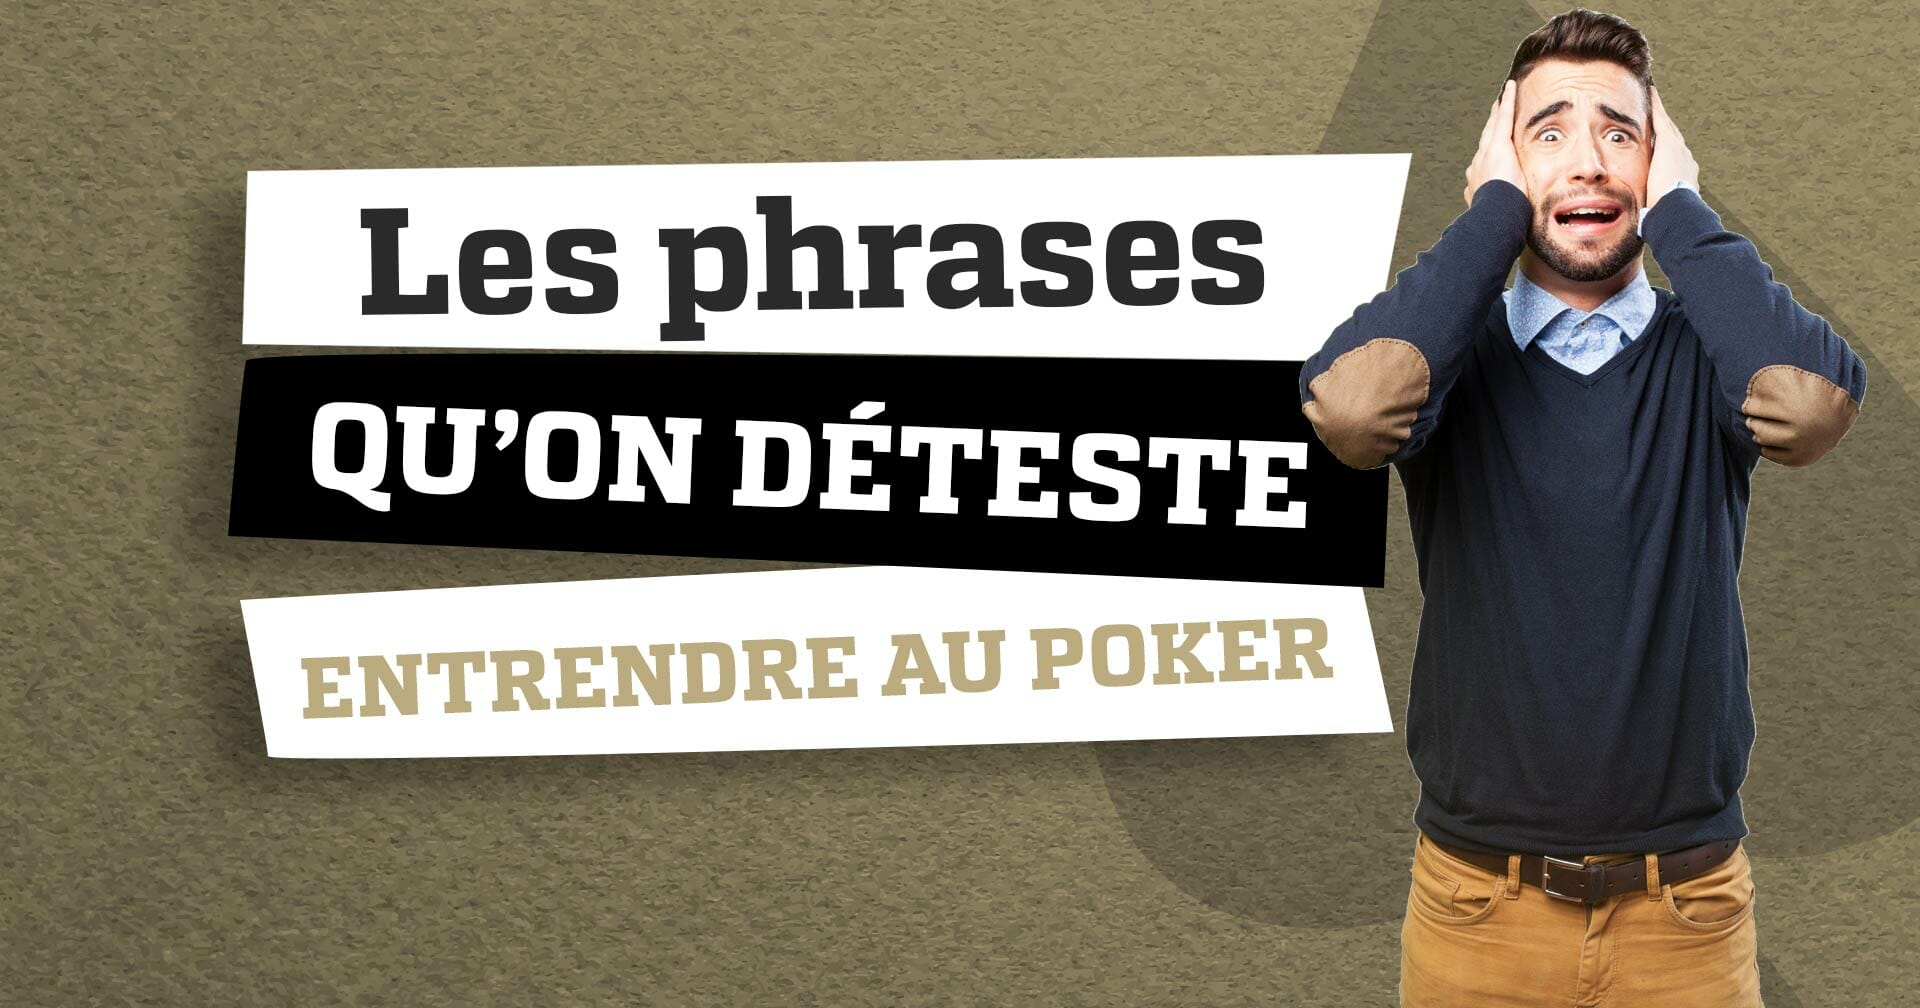 phrases détester poker